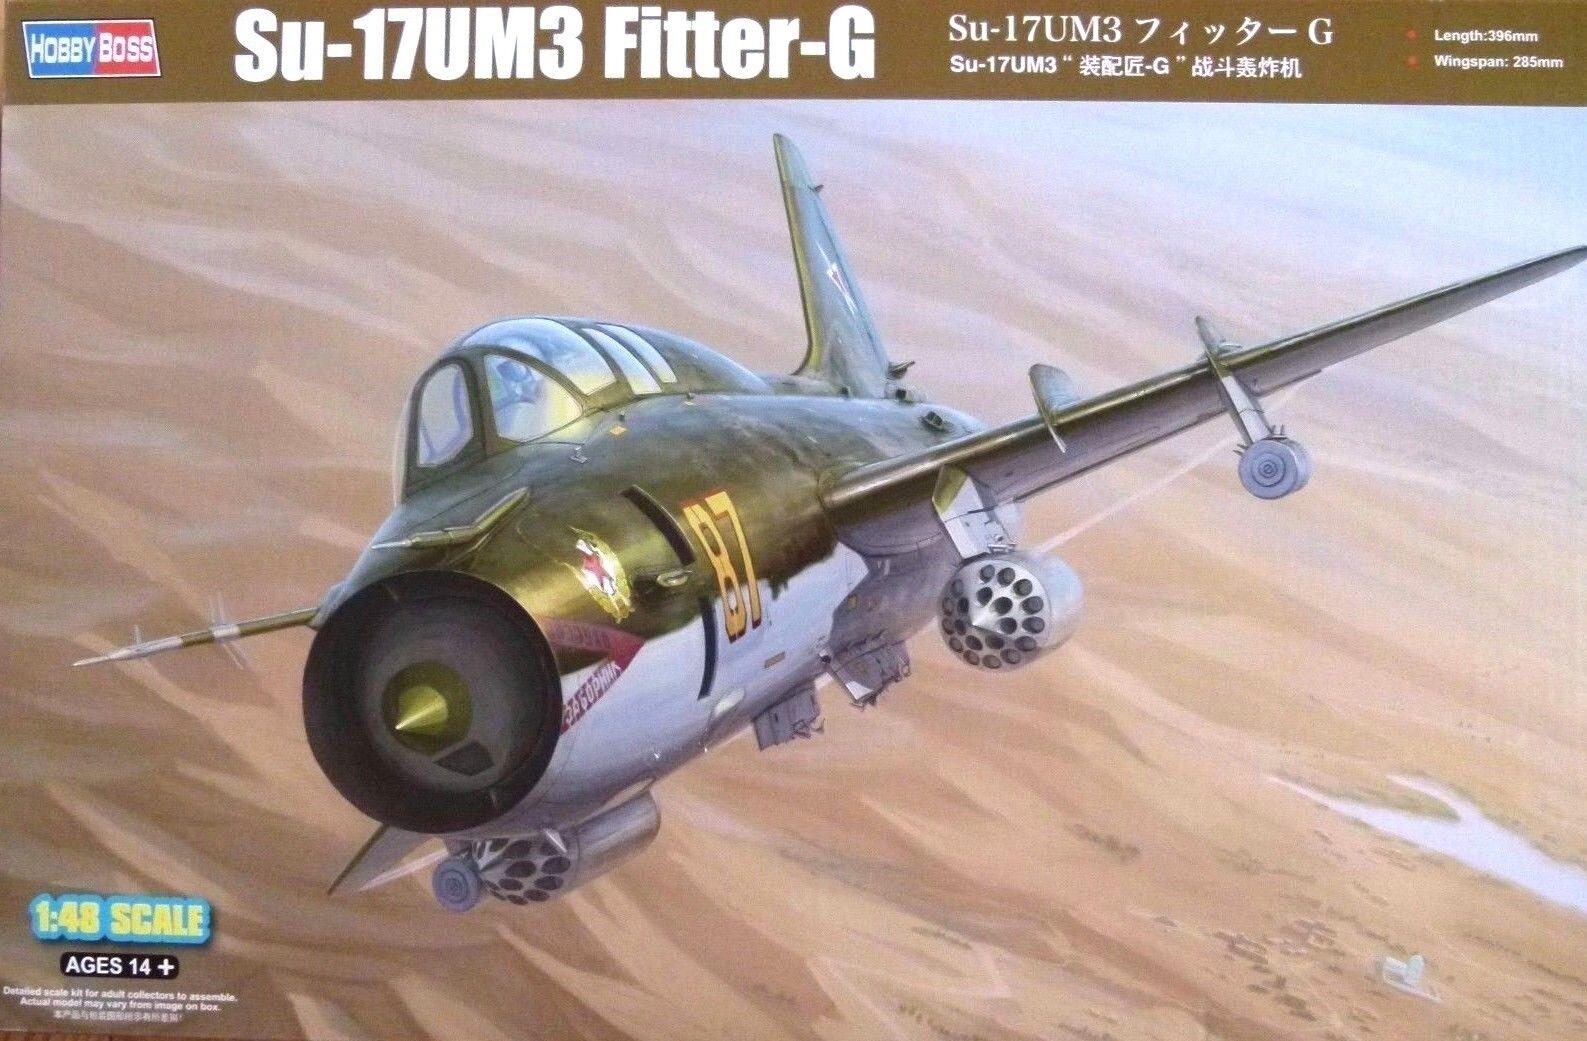 Hobbyboss 1 48 Sukhoi Su-17UM3 Fitter-G Aircraft Model Kit